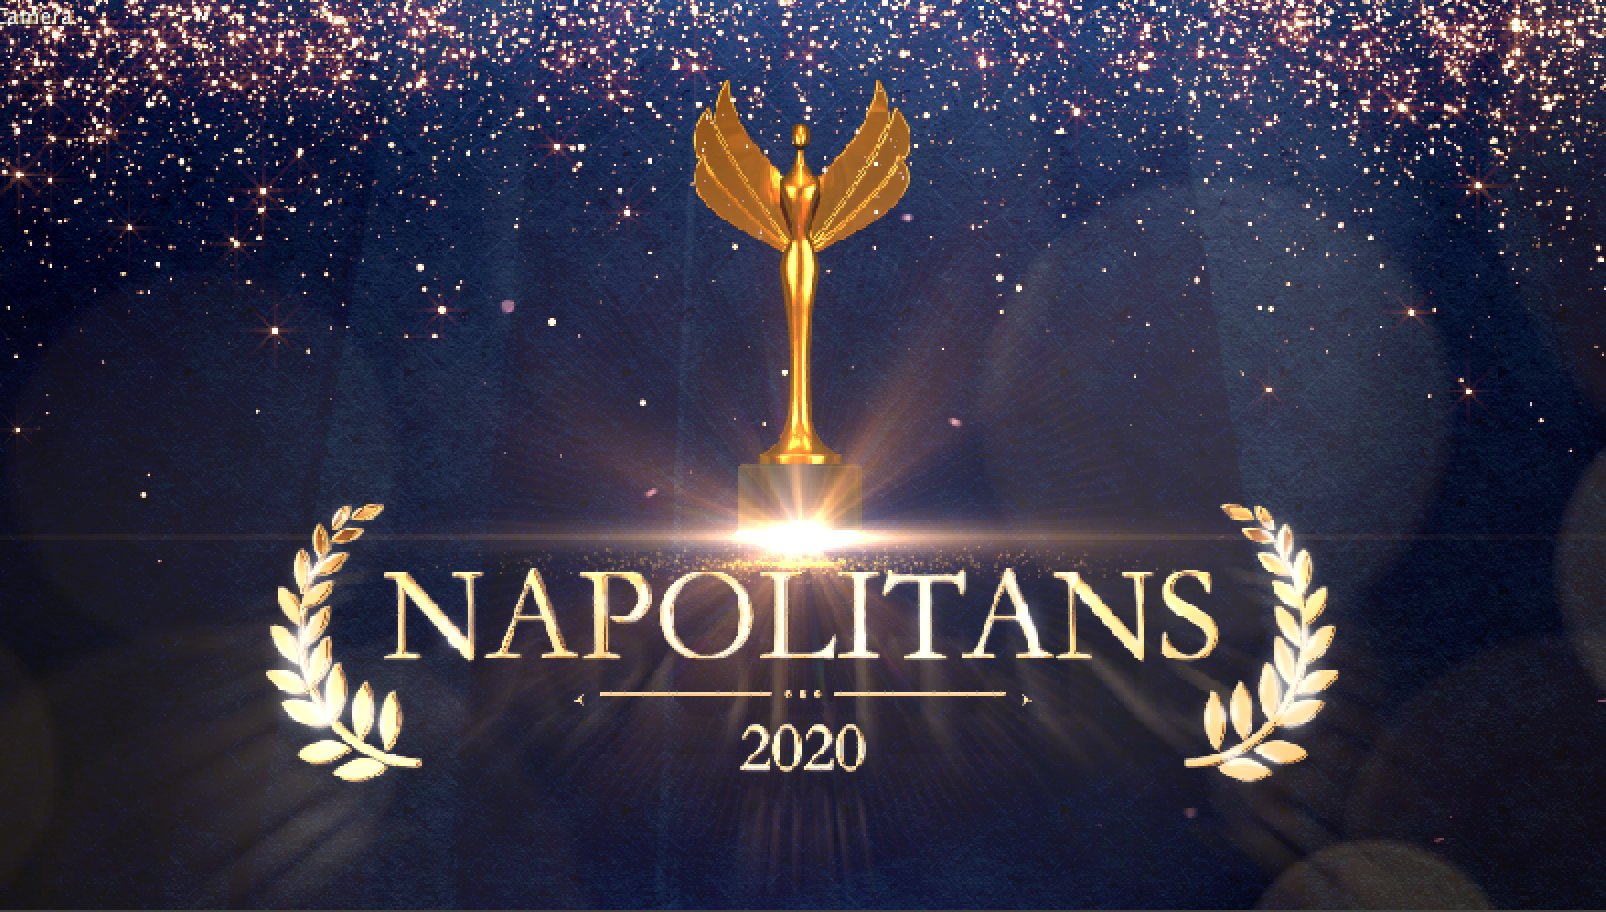 Napolitans 2020 - Napolitan Victory Awards - Lista de nominados